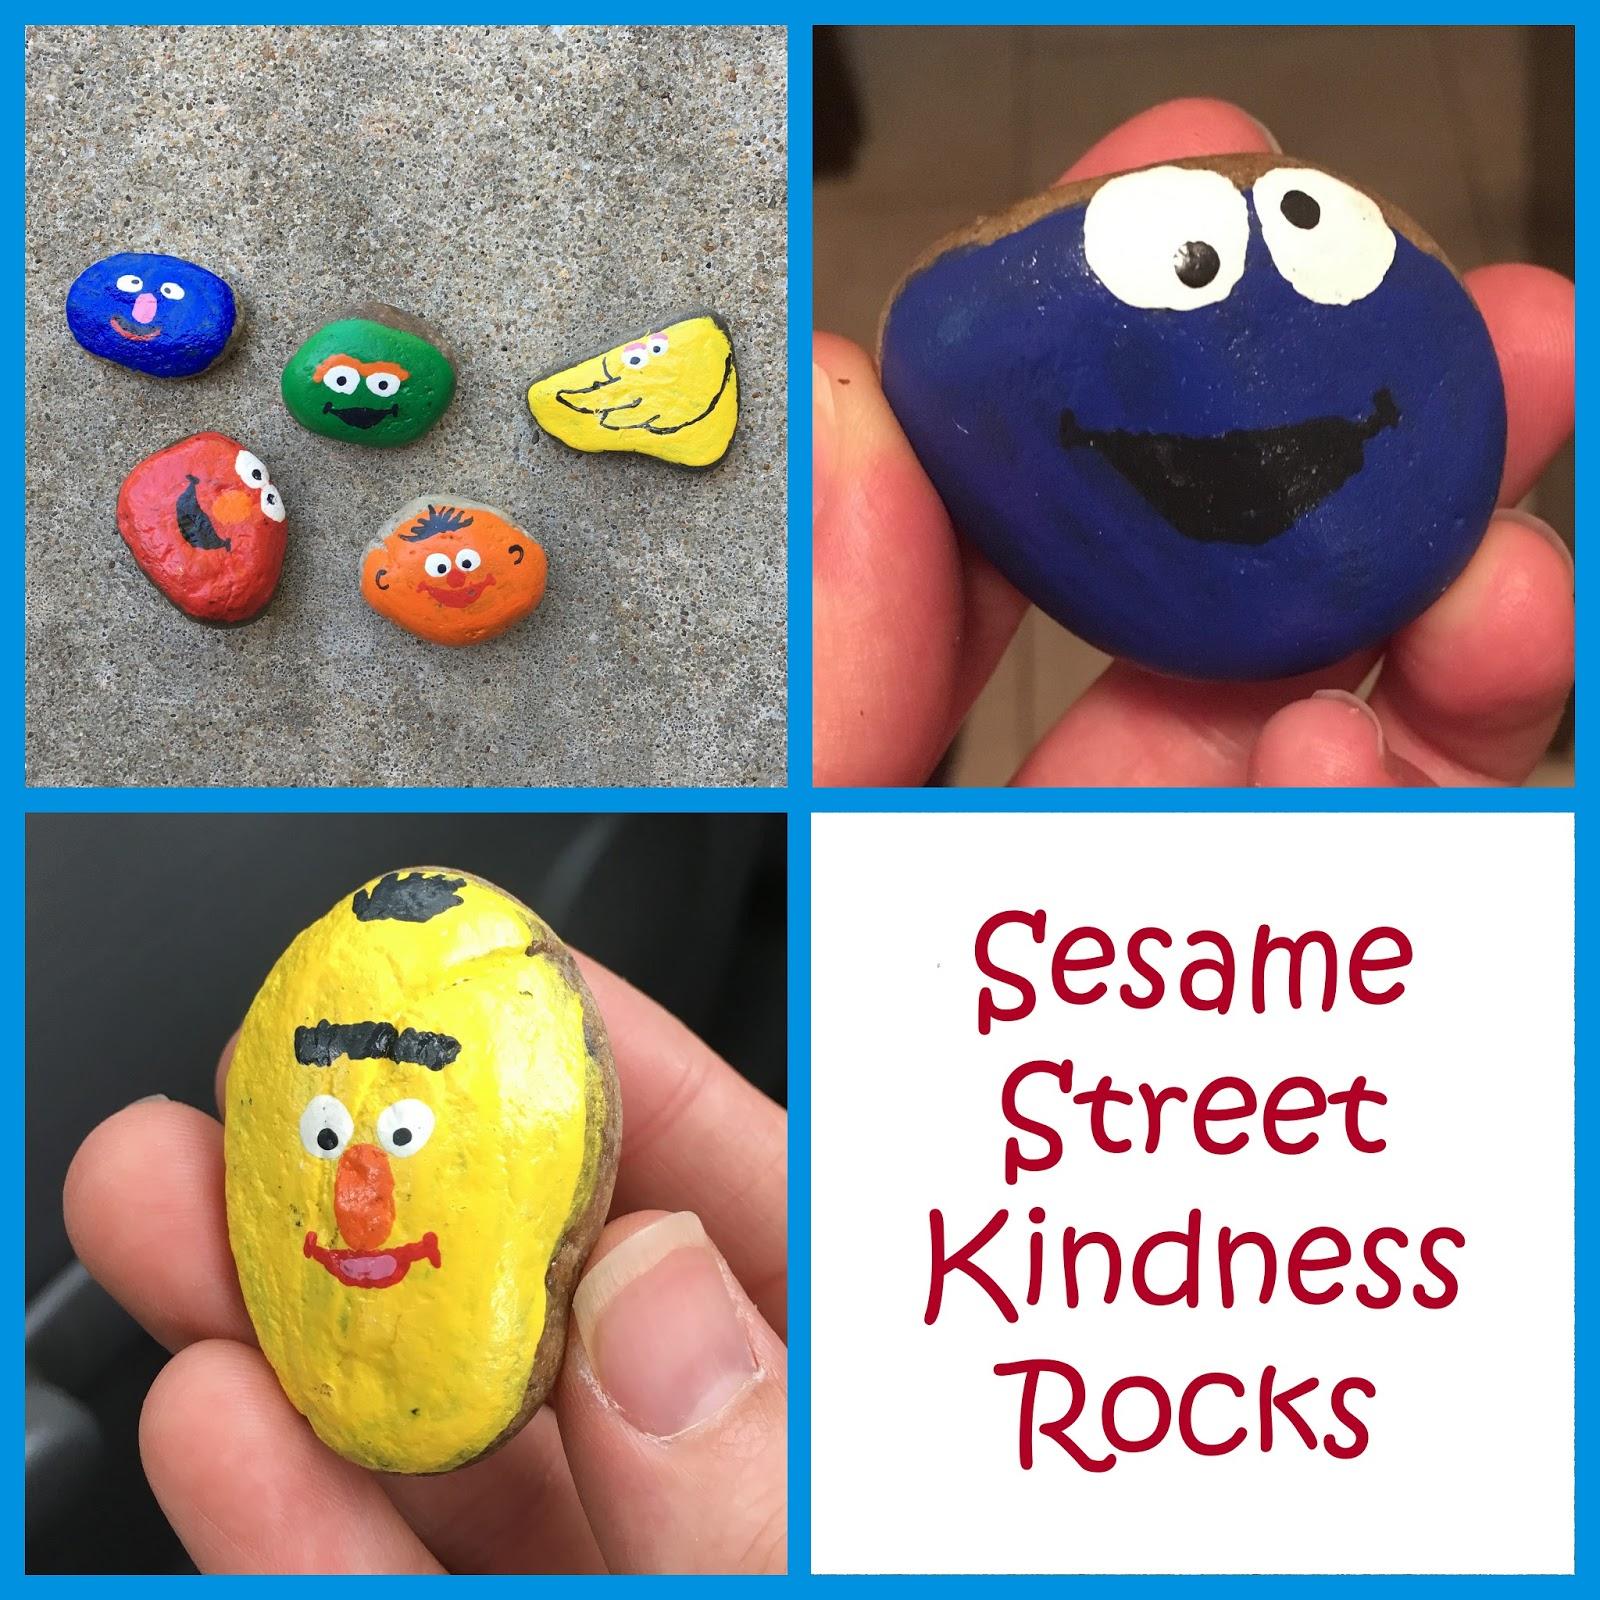 What I Live For Sesame Street Kindness Rocks